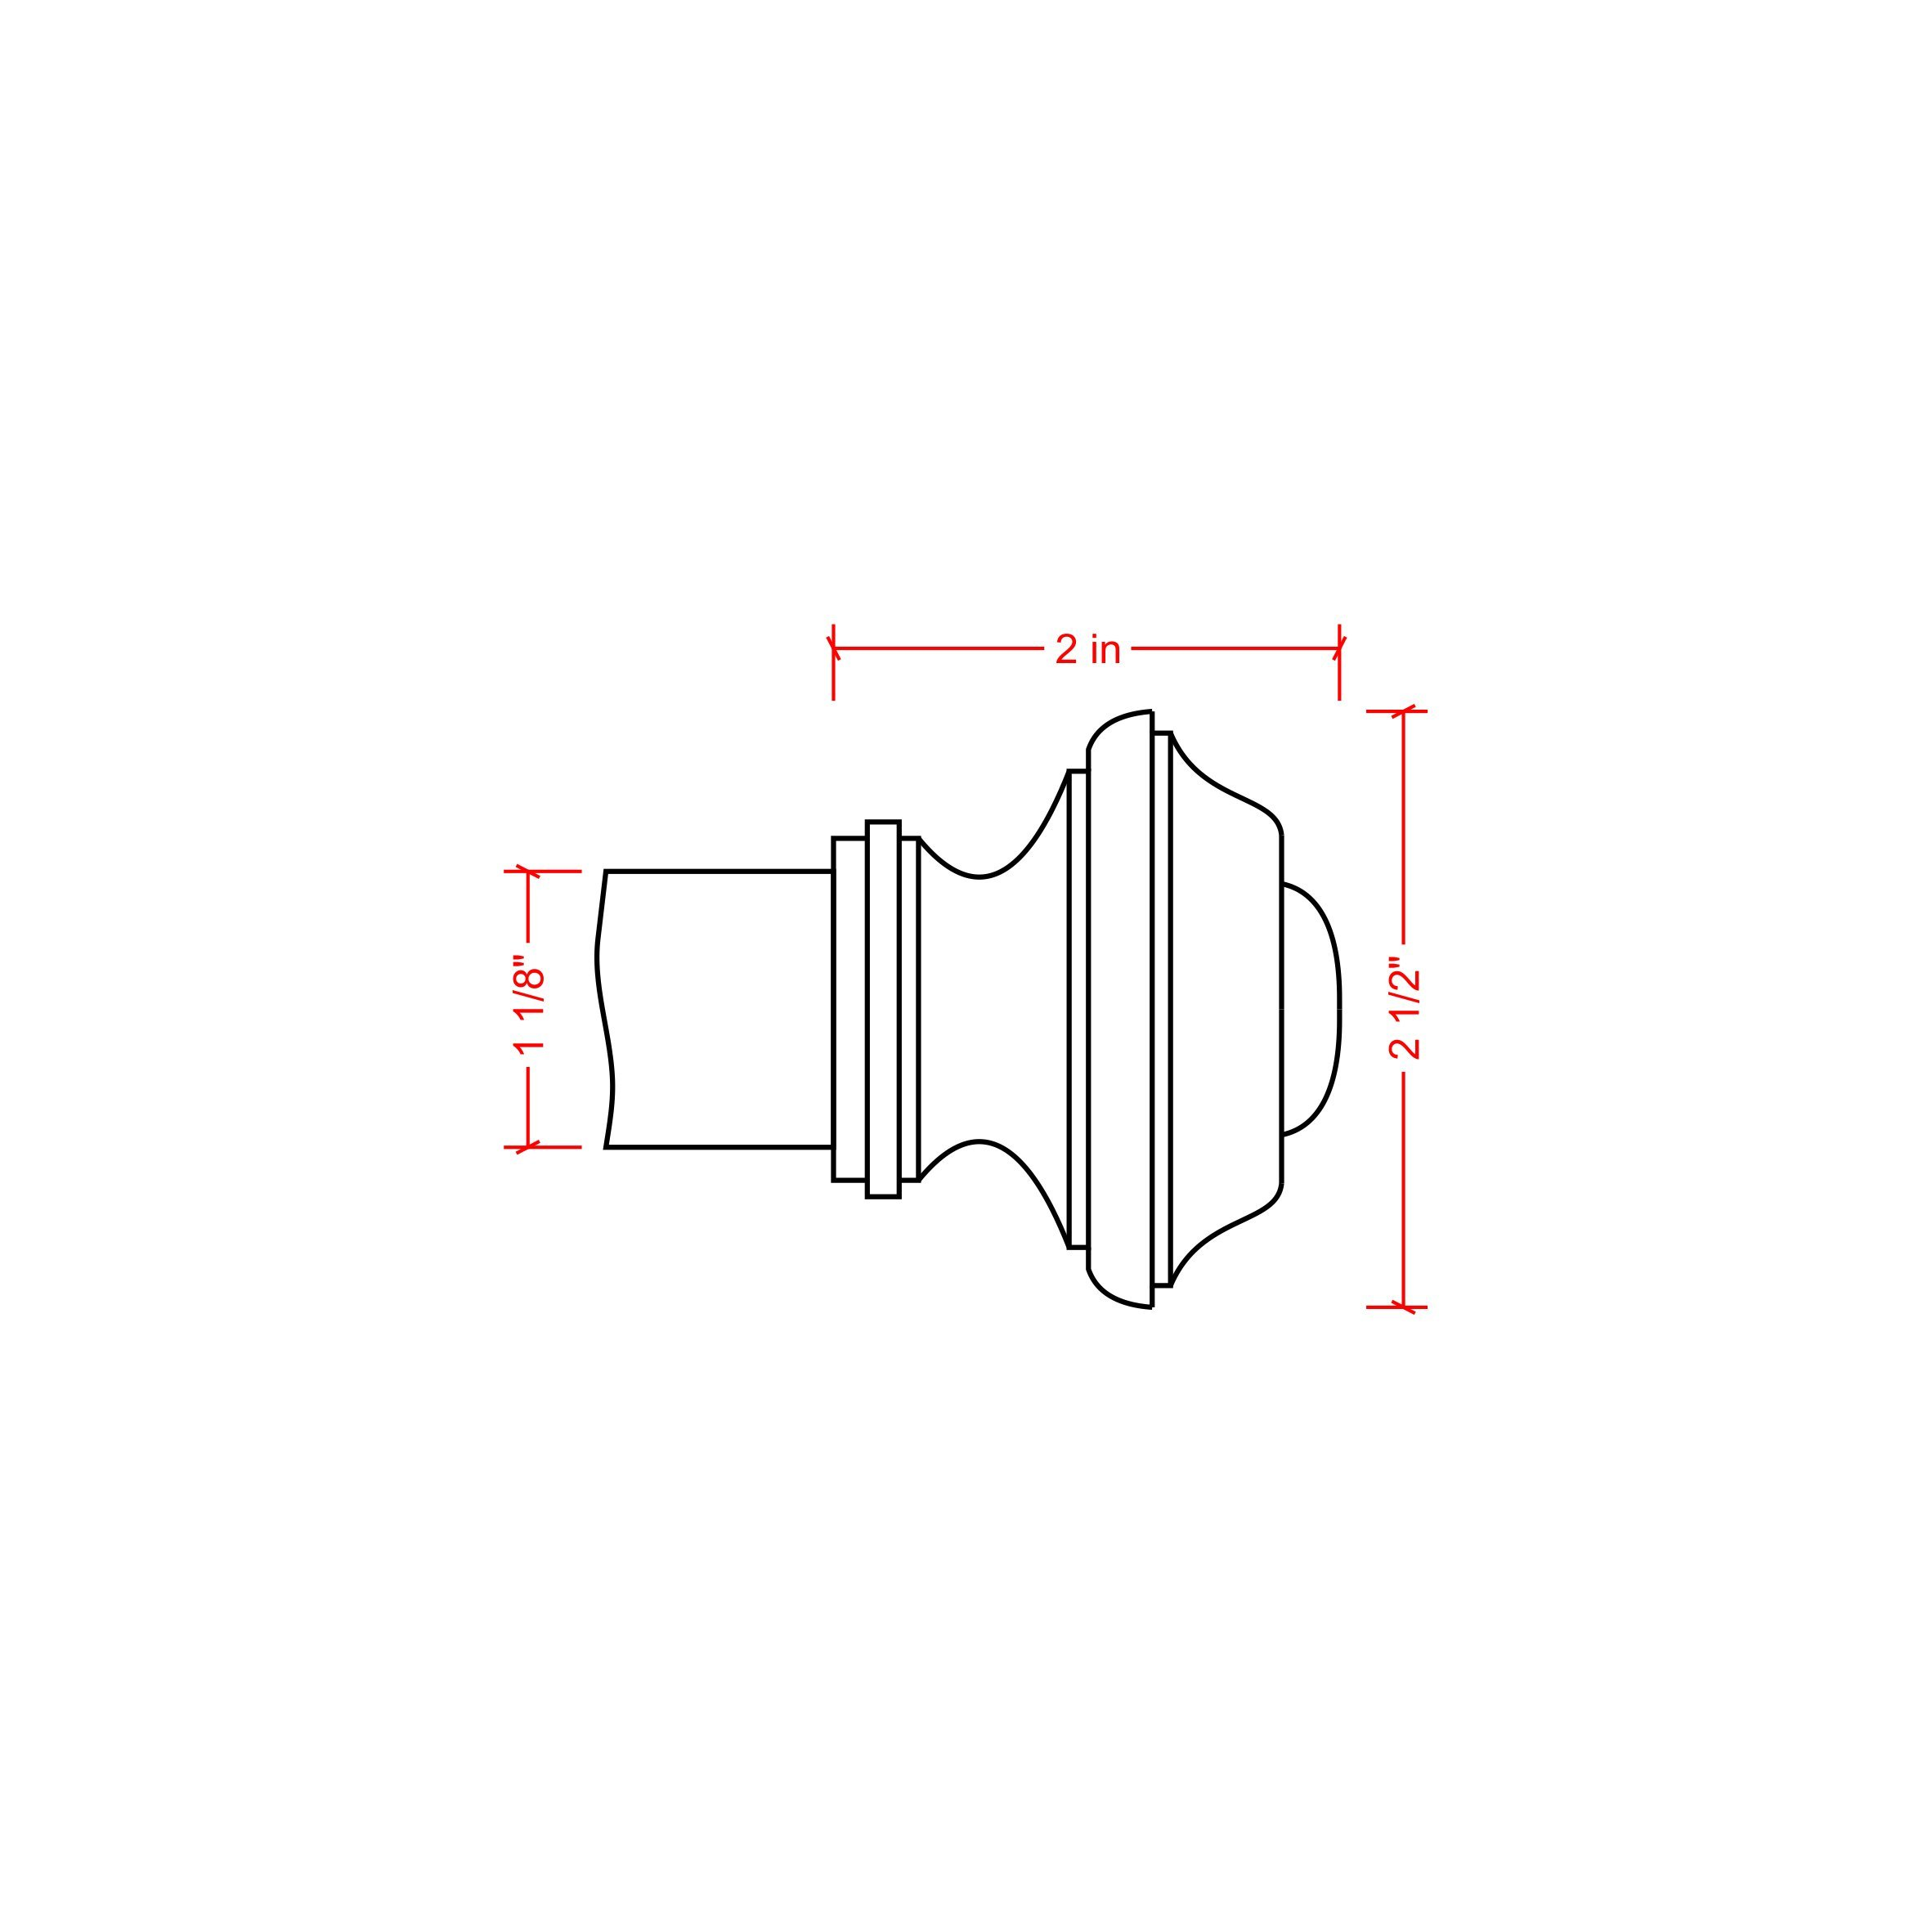 Ivilon Drapery Treatment Window Curtain Rod - Square Design 1 1/8 Rod. 28 to 48 Inch. Satin Nickel by Ivilon (Image #4)